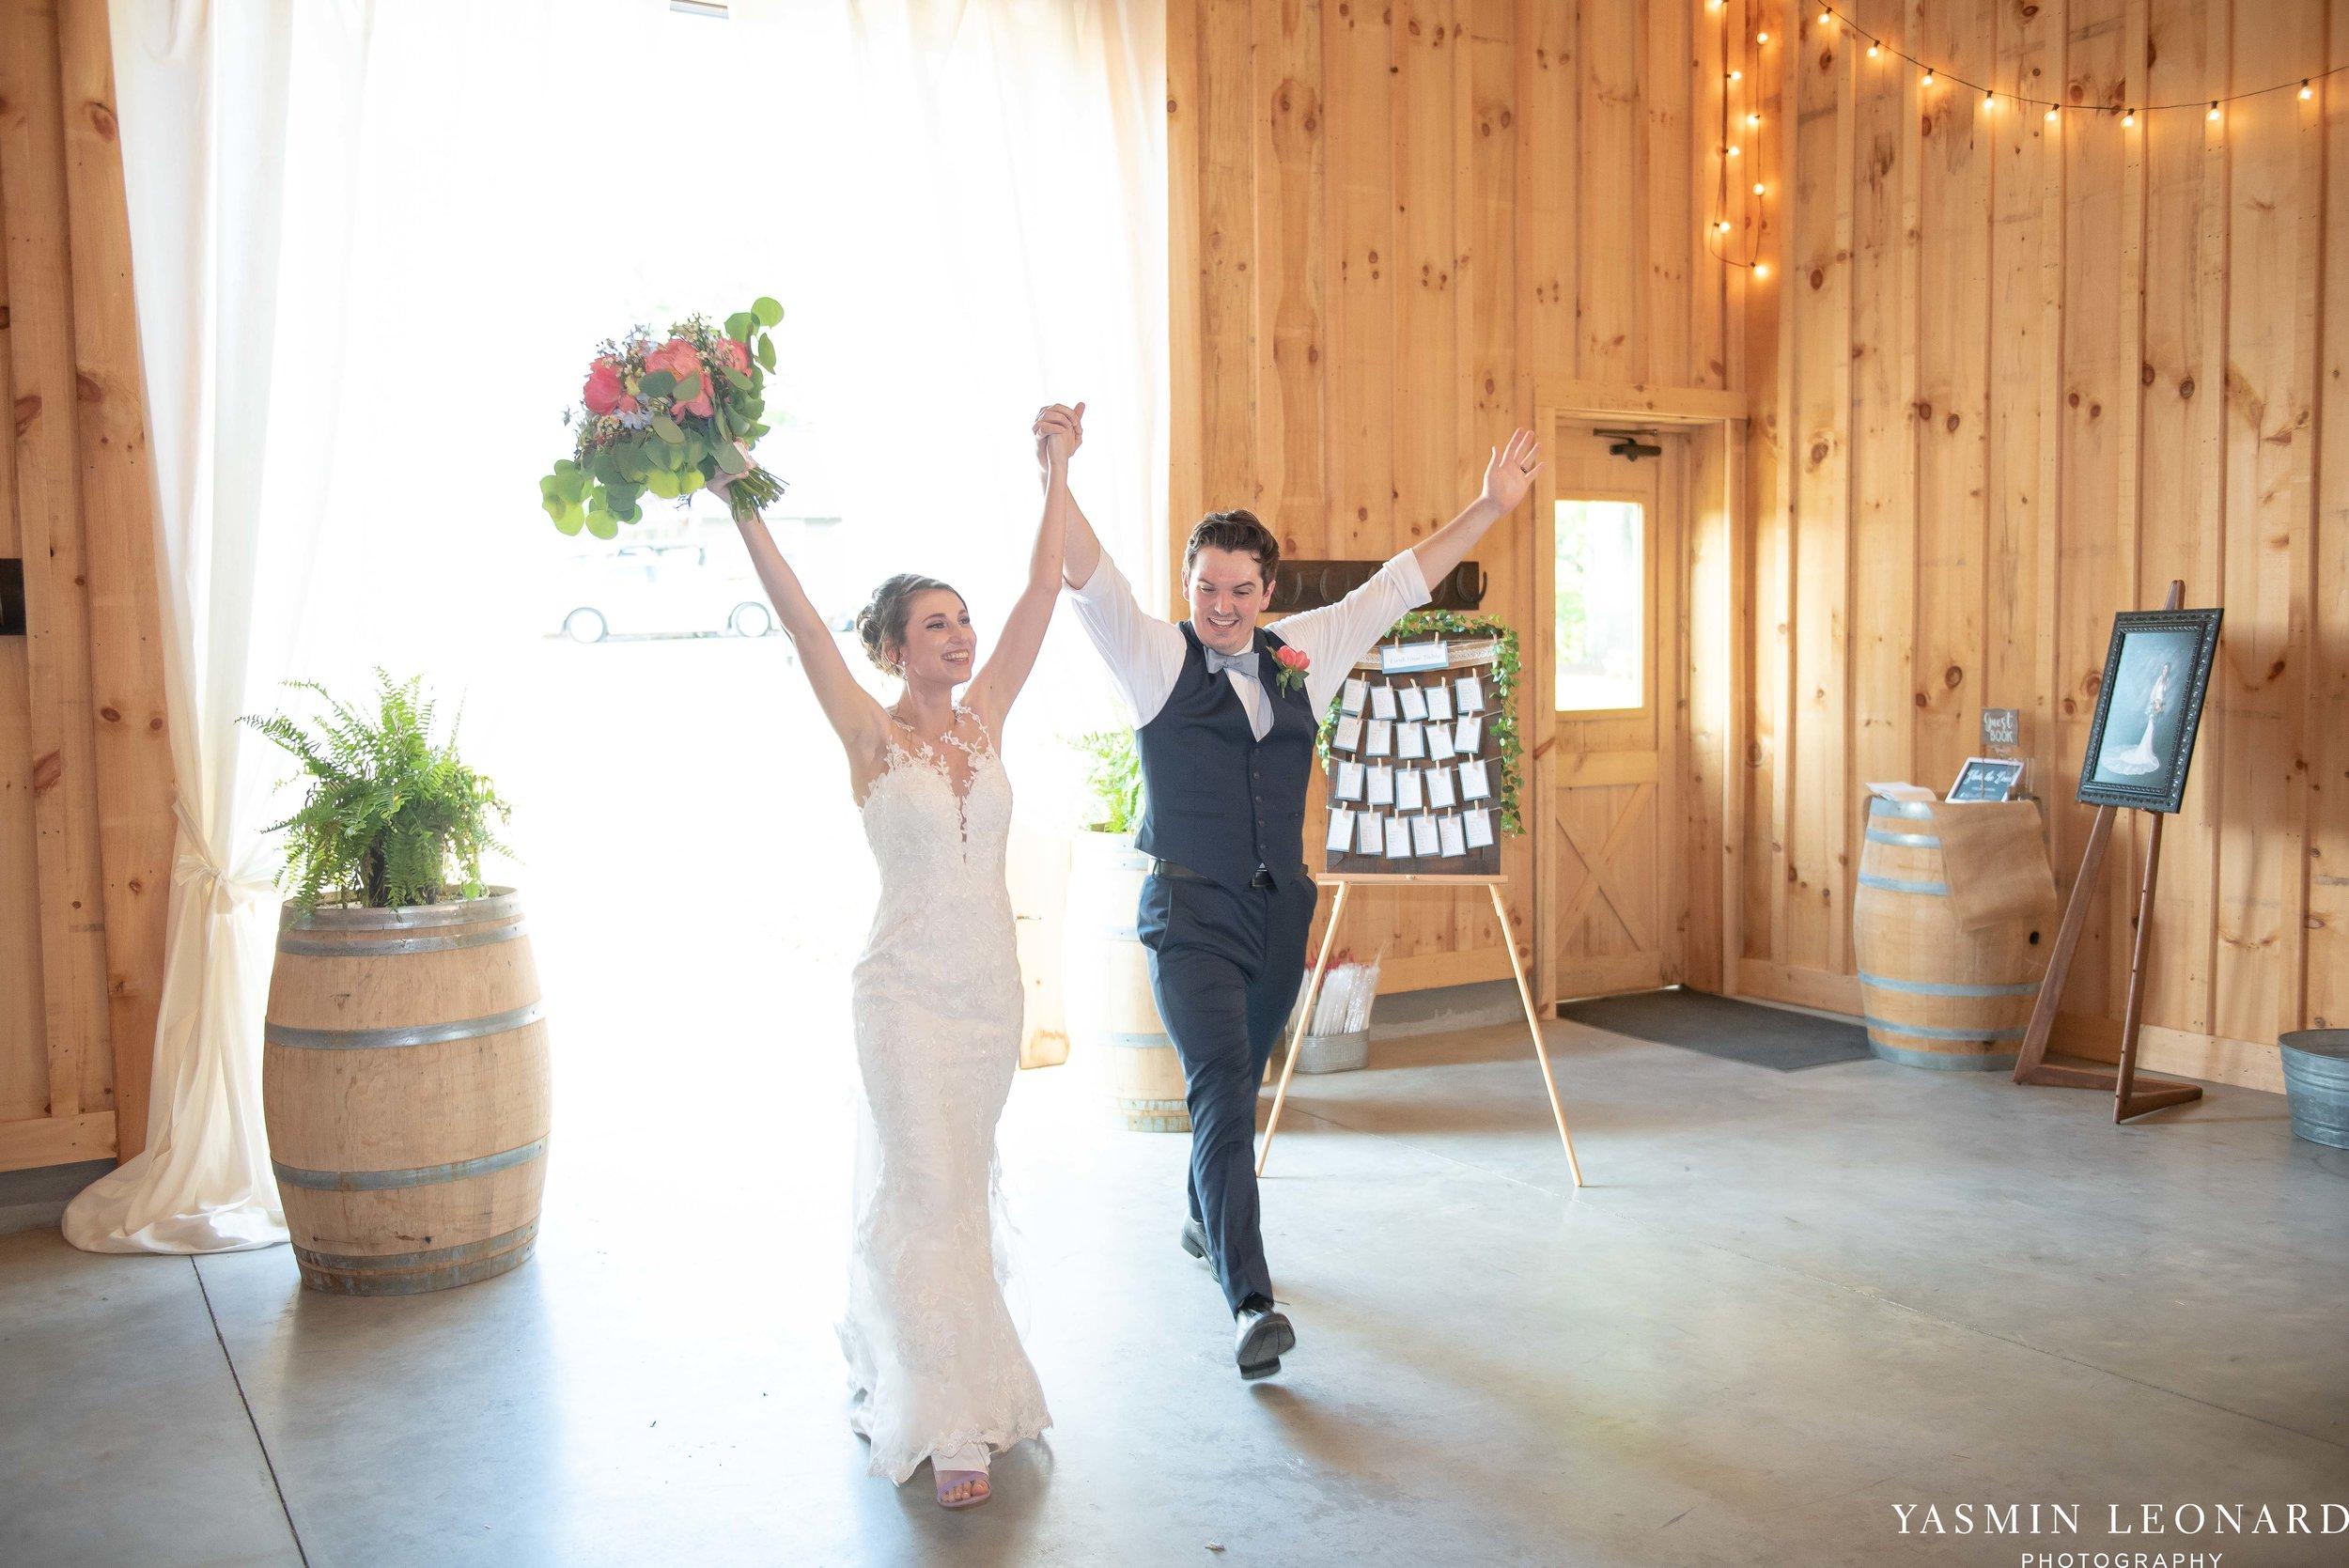 Old Homeplace Vineyard - NC Weddings - Outdoor Summer Weddings - Peony Boutique - Vineyard Wedding - NC Photographer - Yasmin Leonard Photography-48.jpg